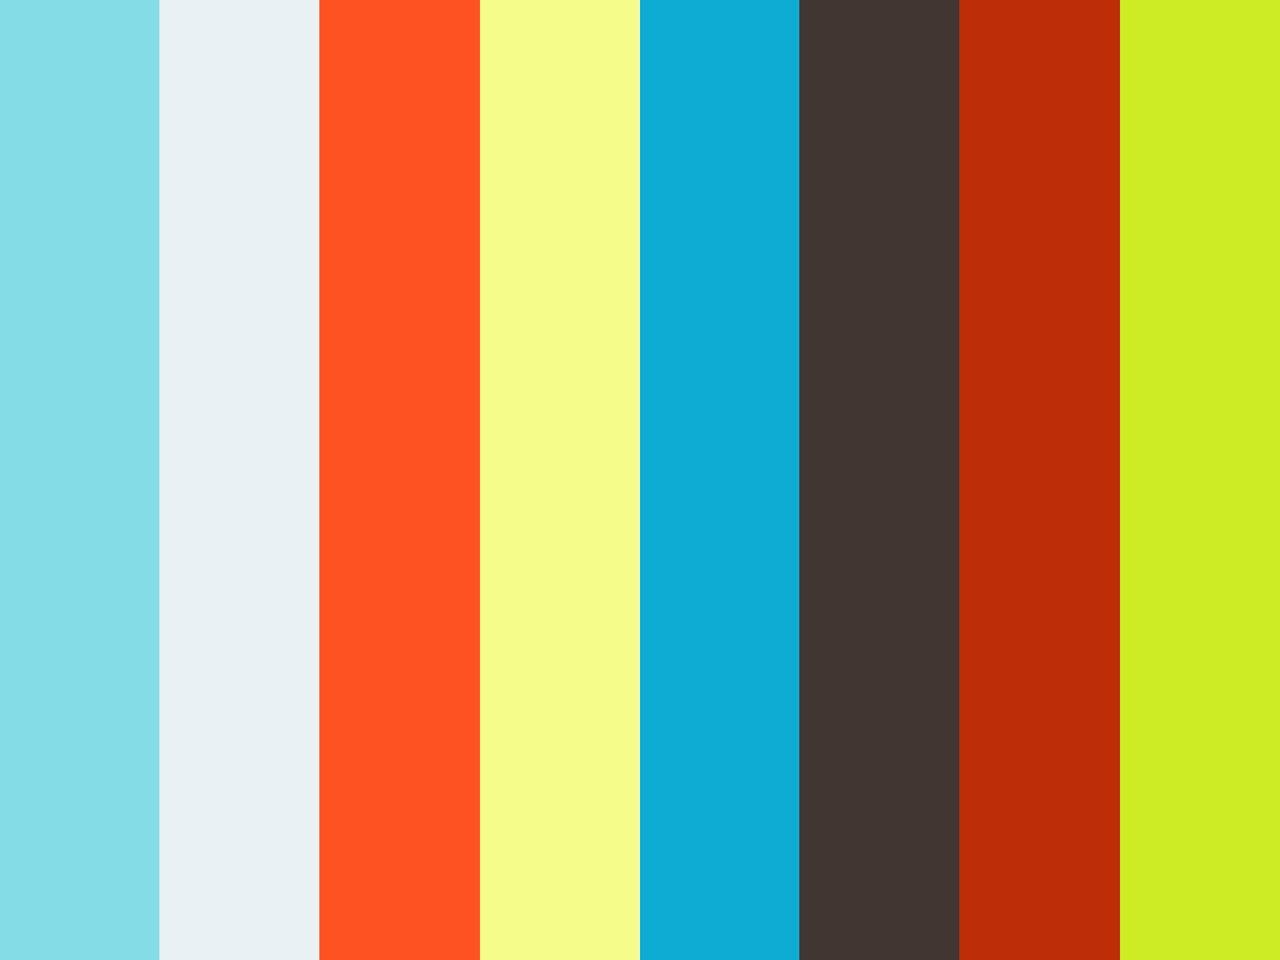 Colorgrade Showreel 2014